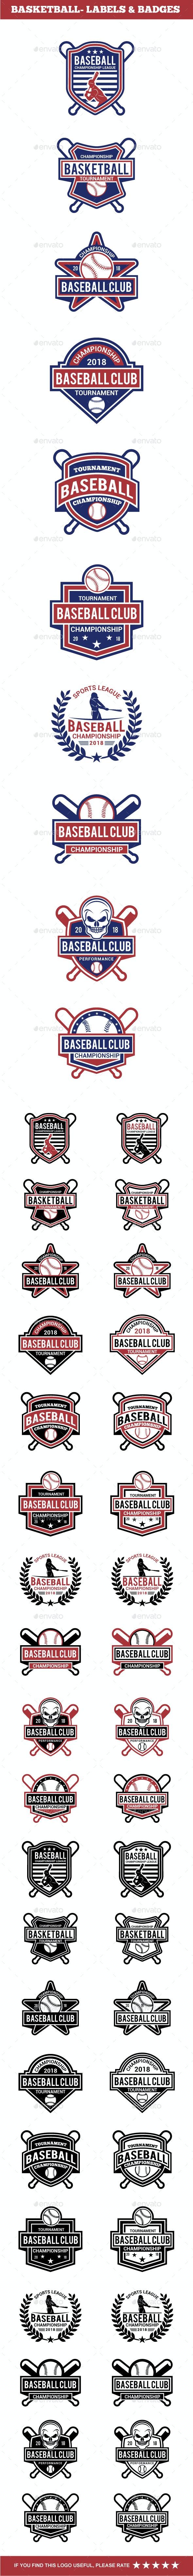 Baseball Badge & Stickers 4